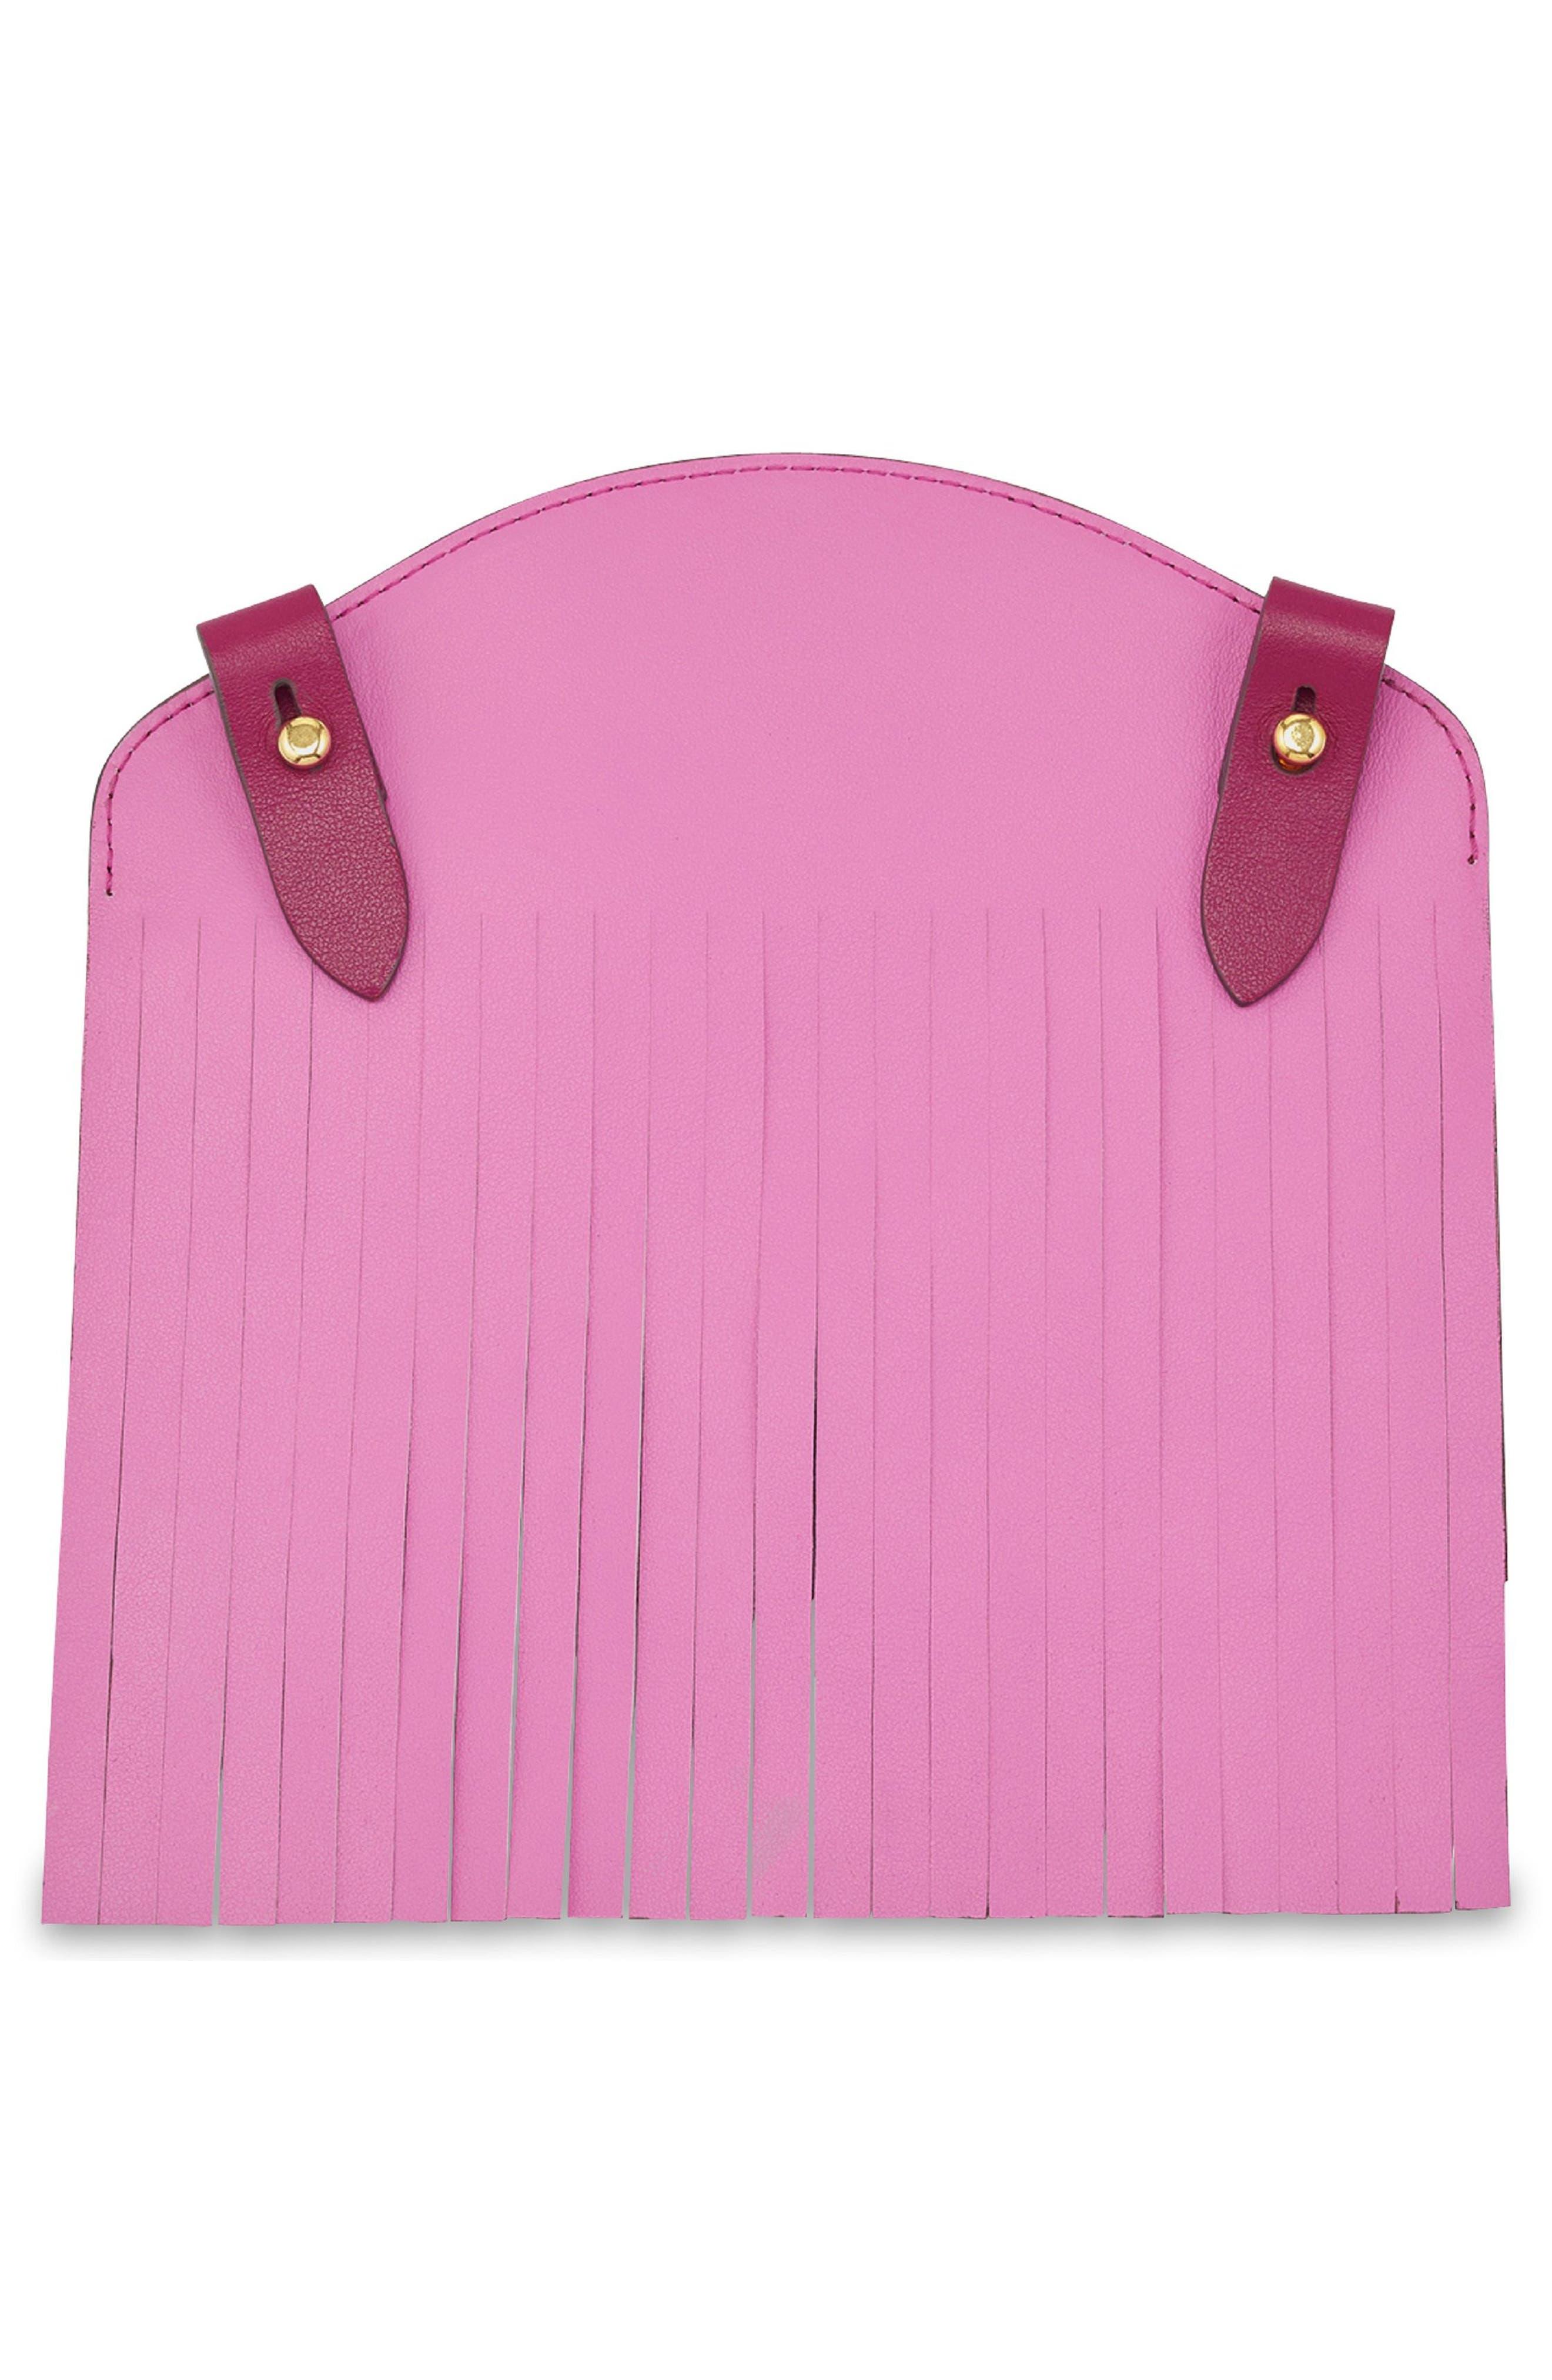 Build a Bag Fringe Leather Panels,                             Alternate thumbnail 2, color,                             Raspberry